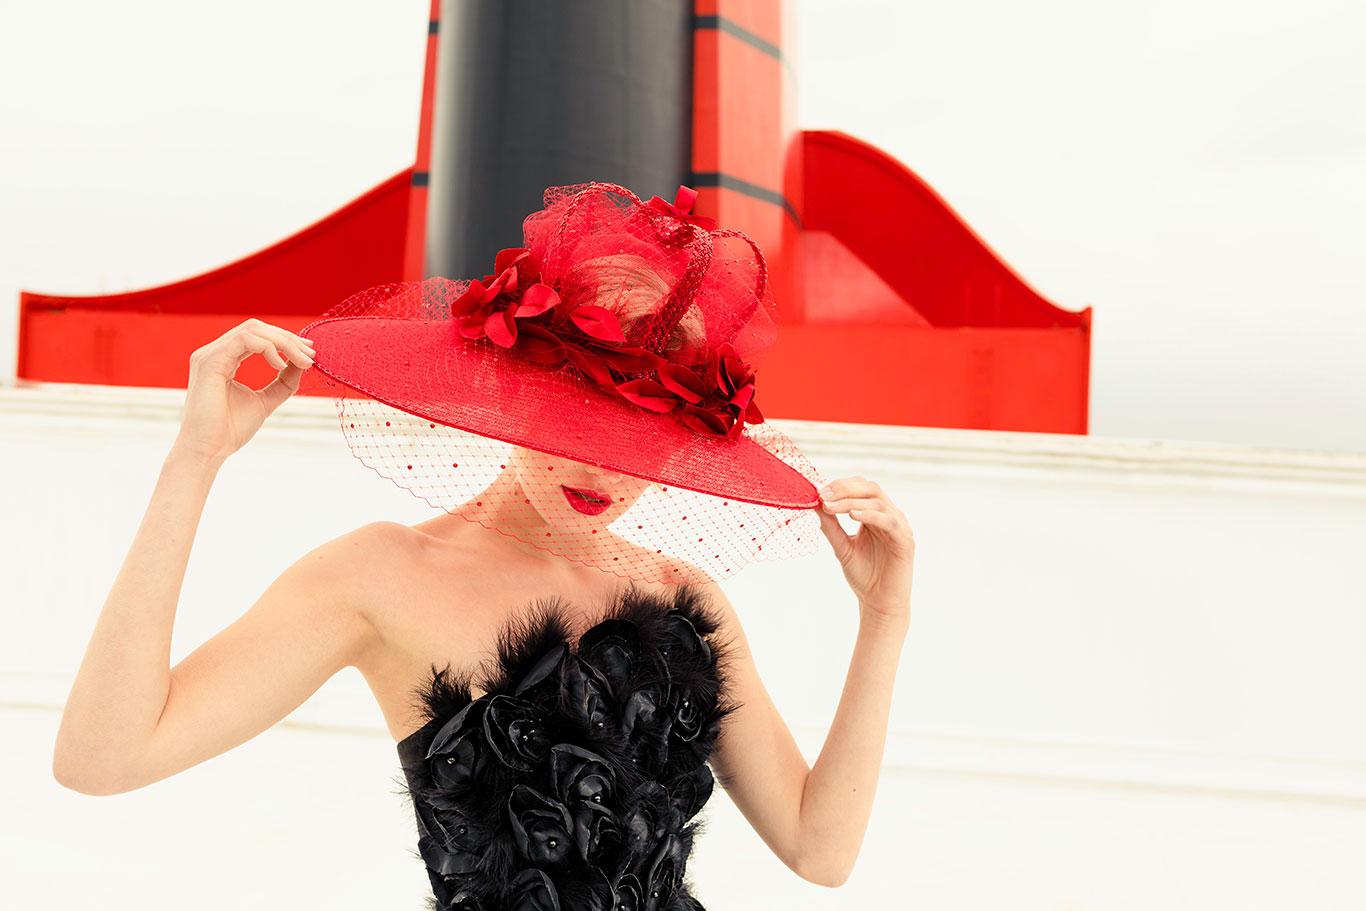 Stephen Jones' hat created for Cunard's Fashion Week Transatlantic cruise